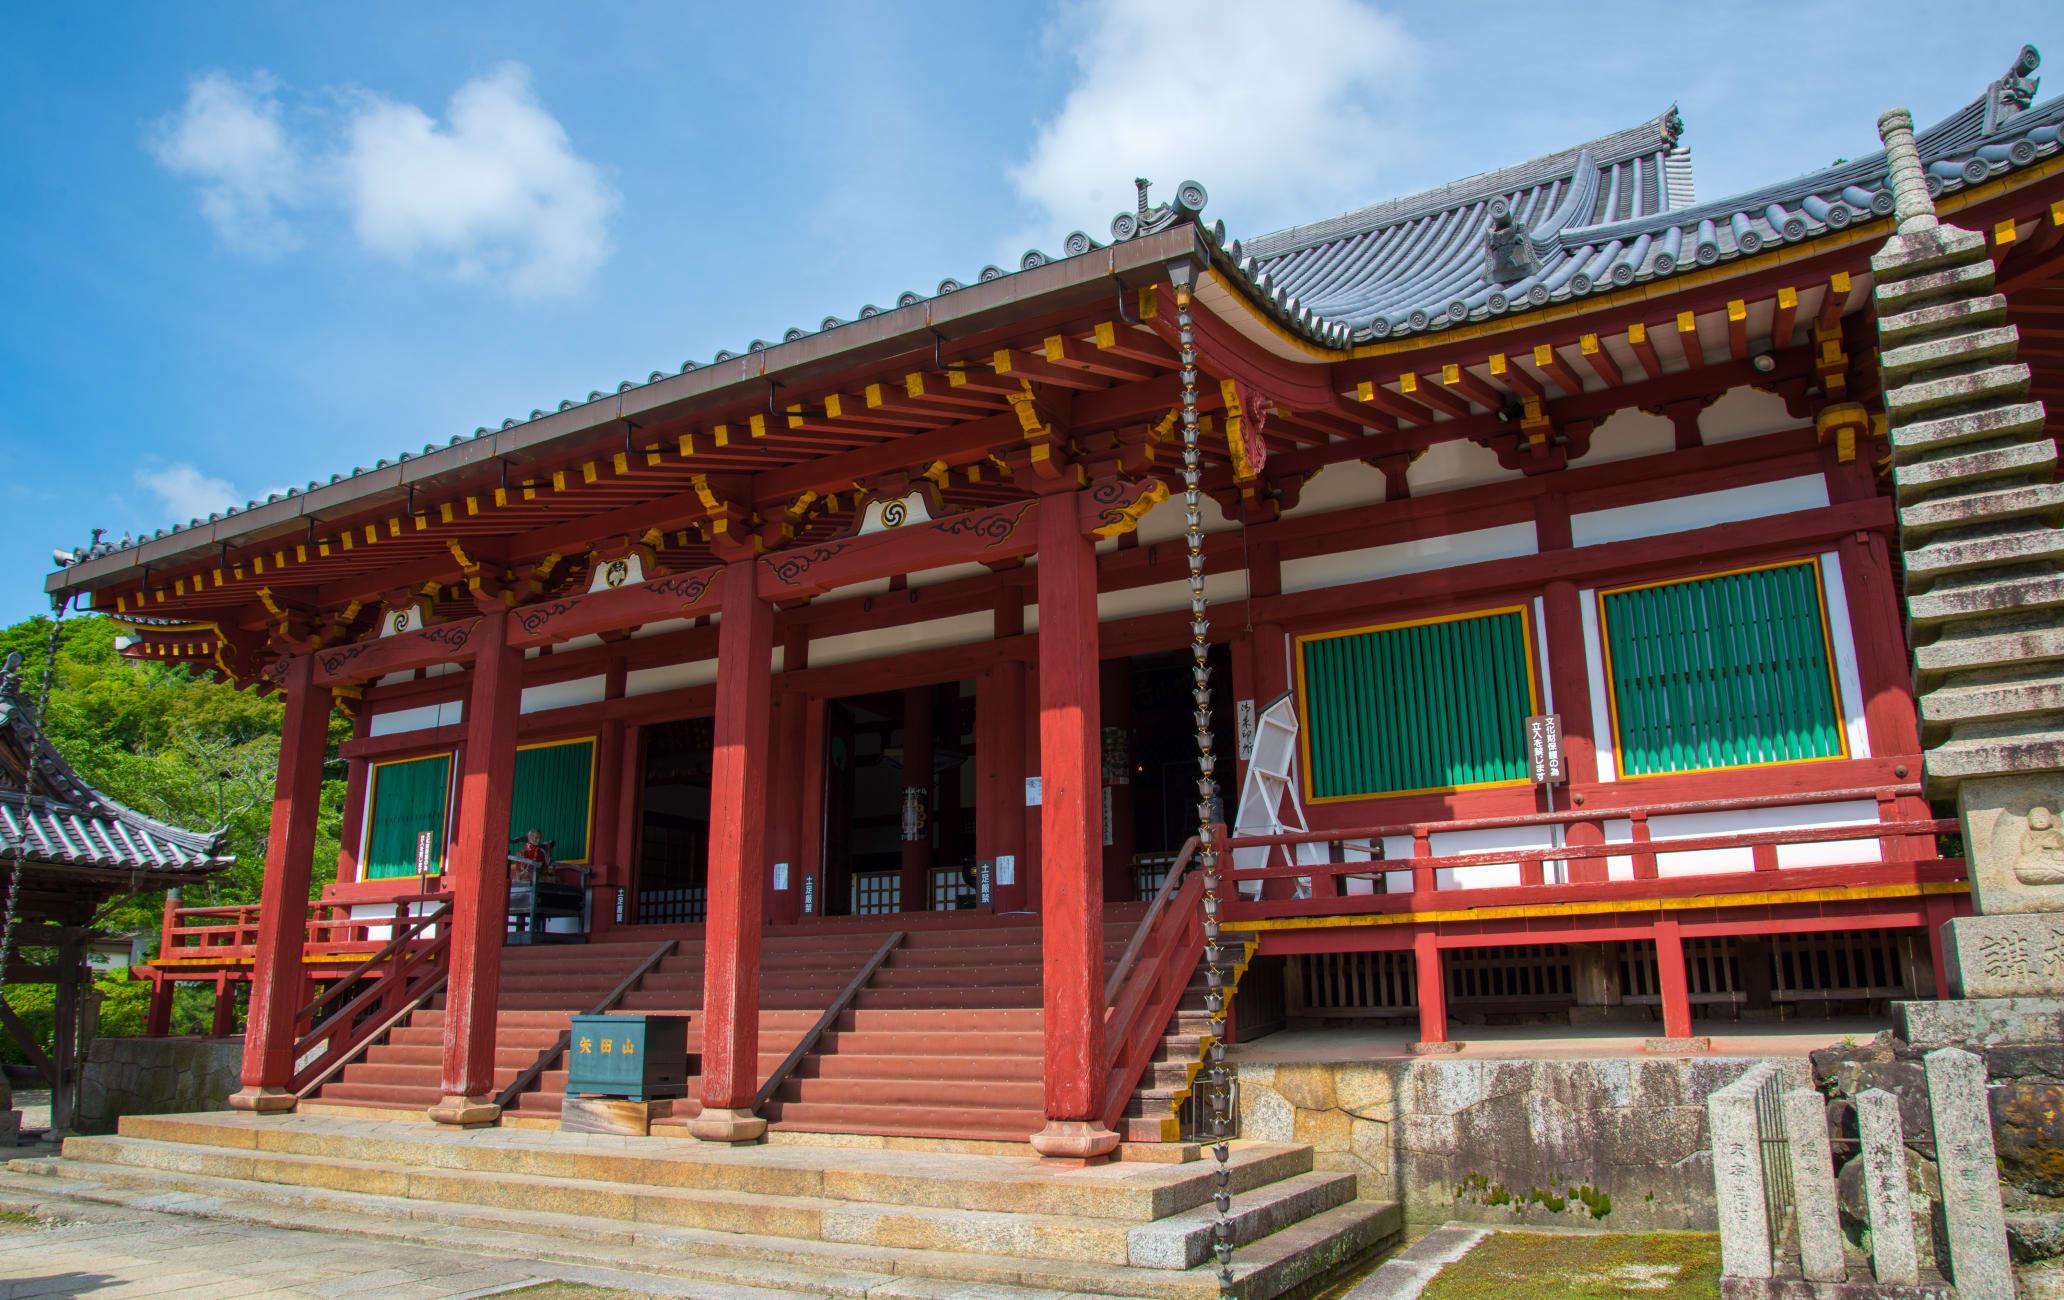 Kongosen-ji Temple